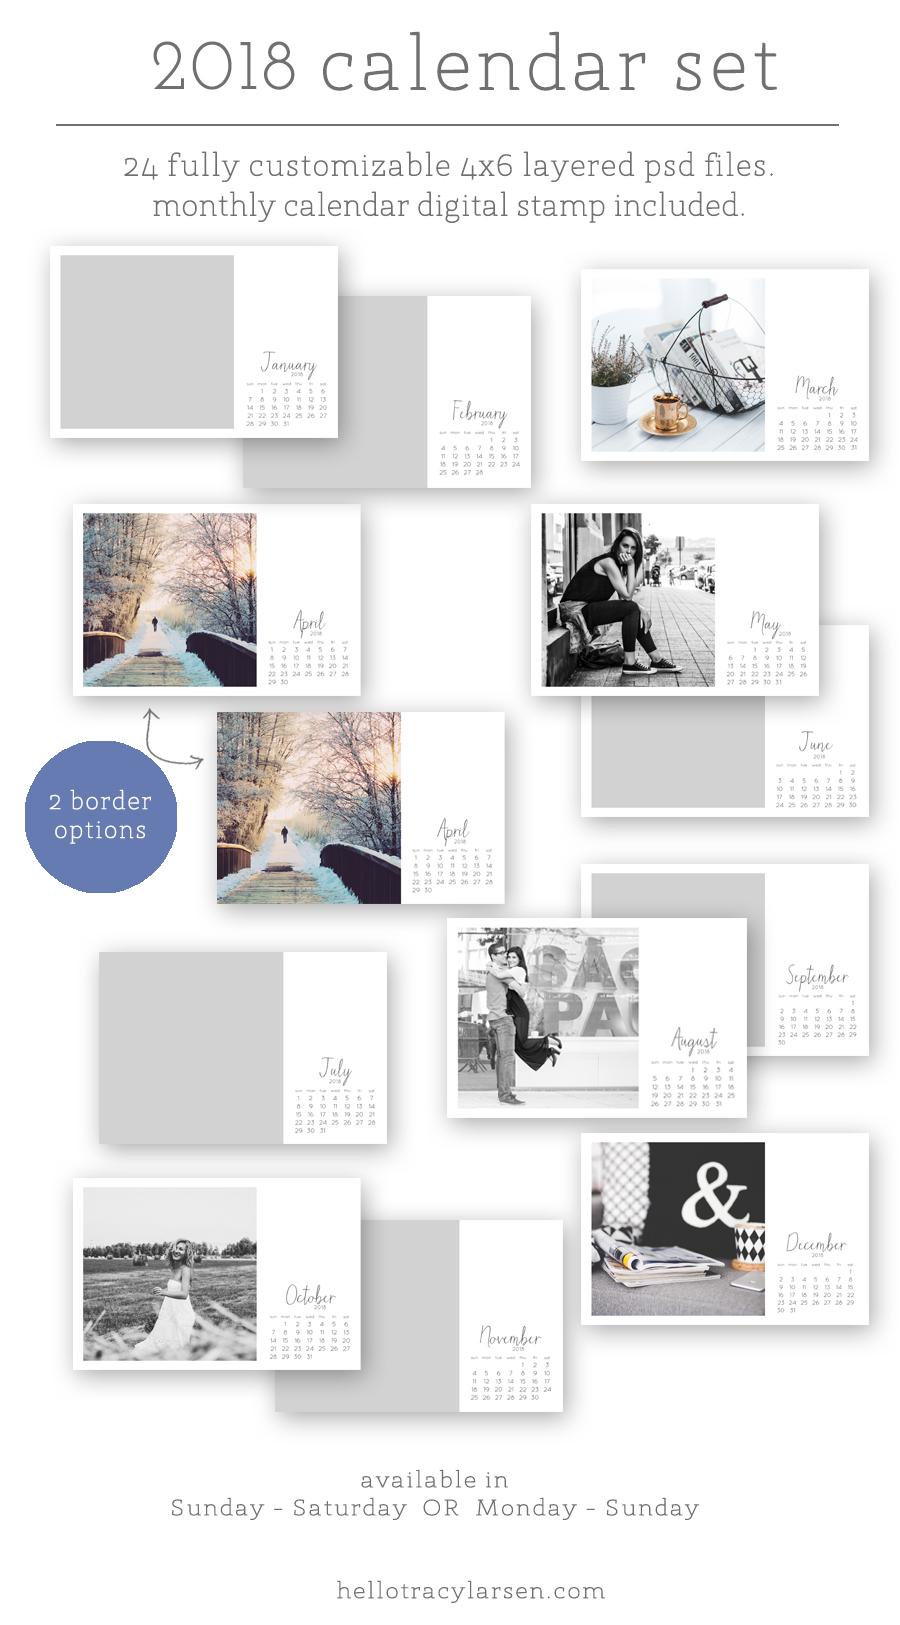 2018 calendar- details-blog.jpg